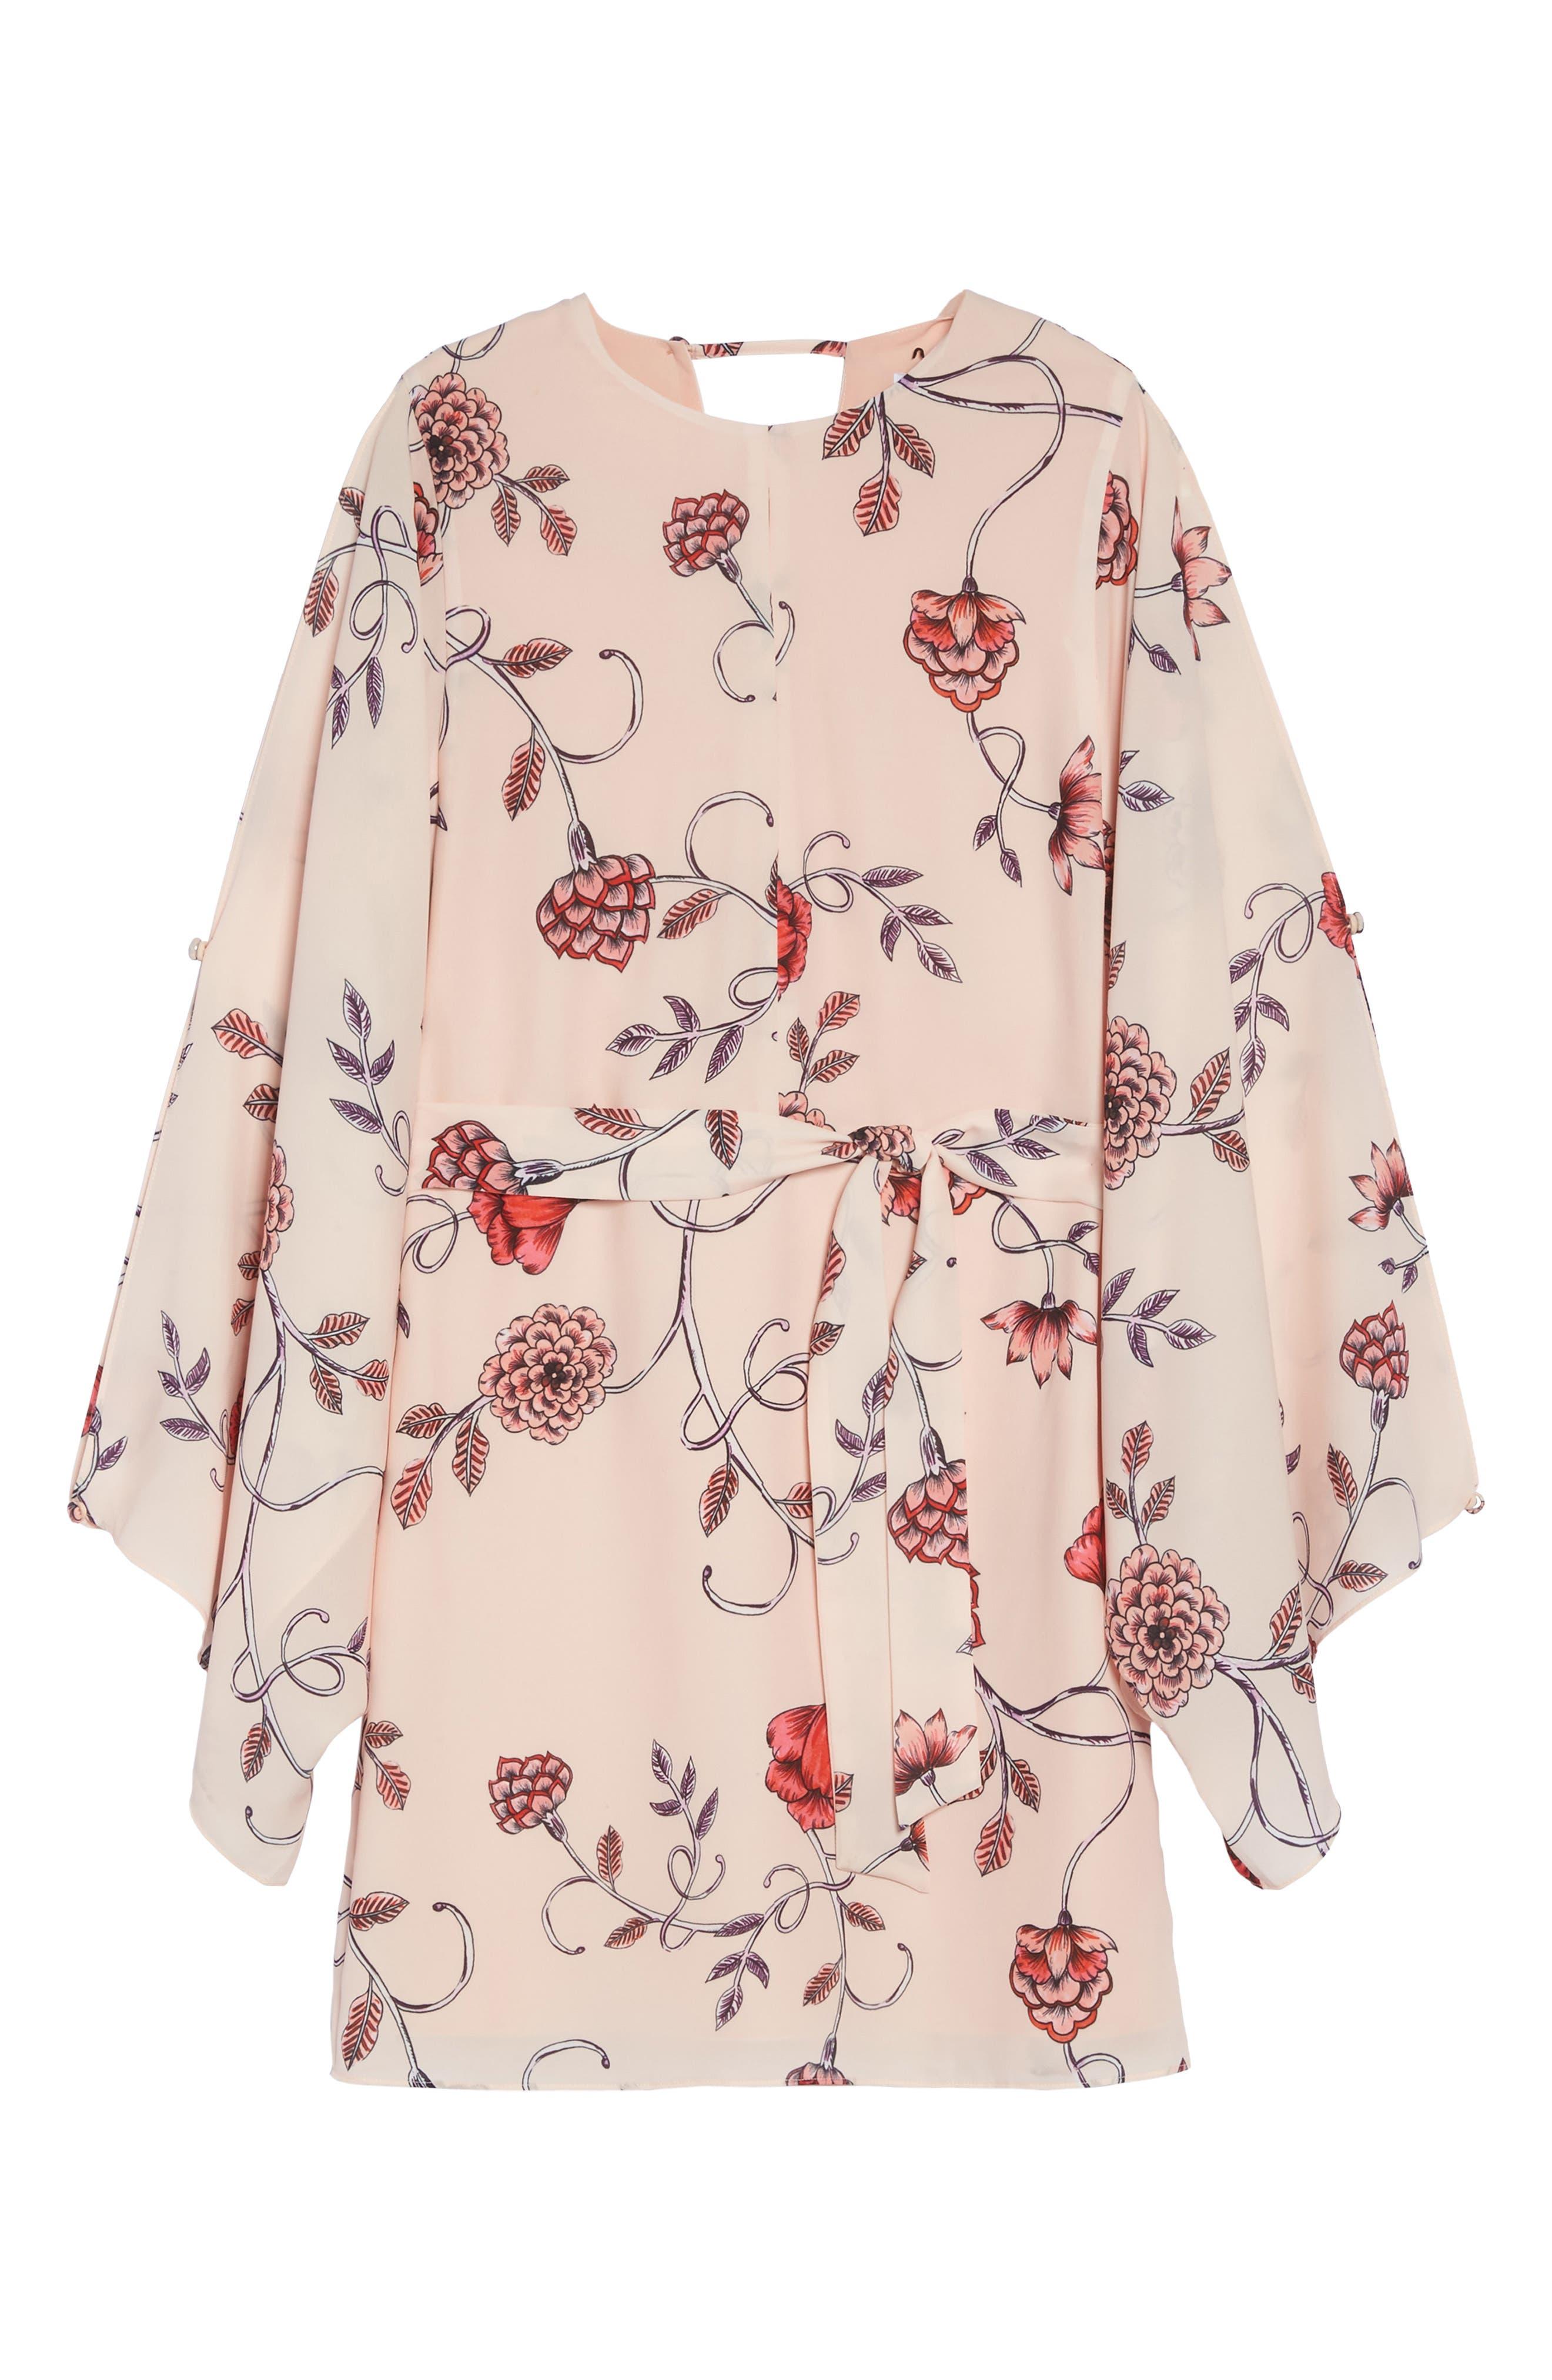 Sakura Bell Sleeve Dress,                             Alternate thumbnail 6, color,                             Pink Print